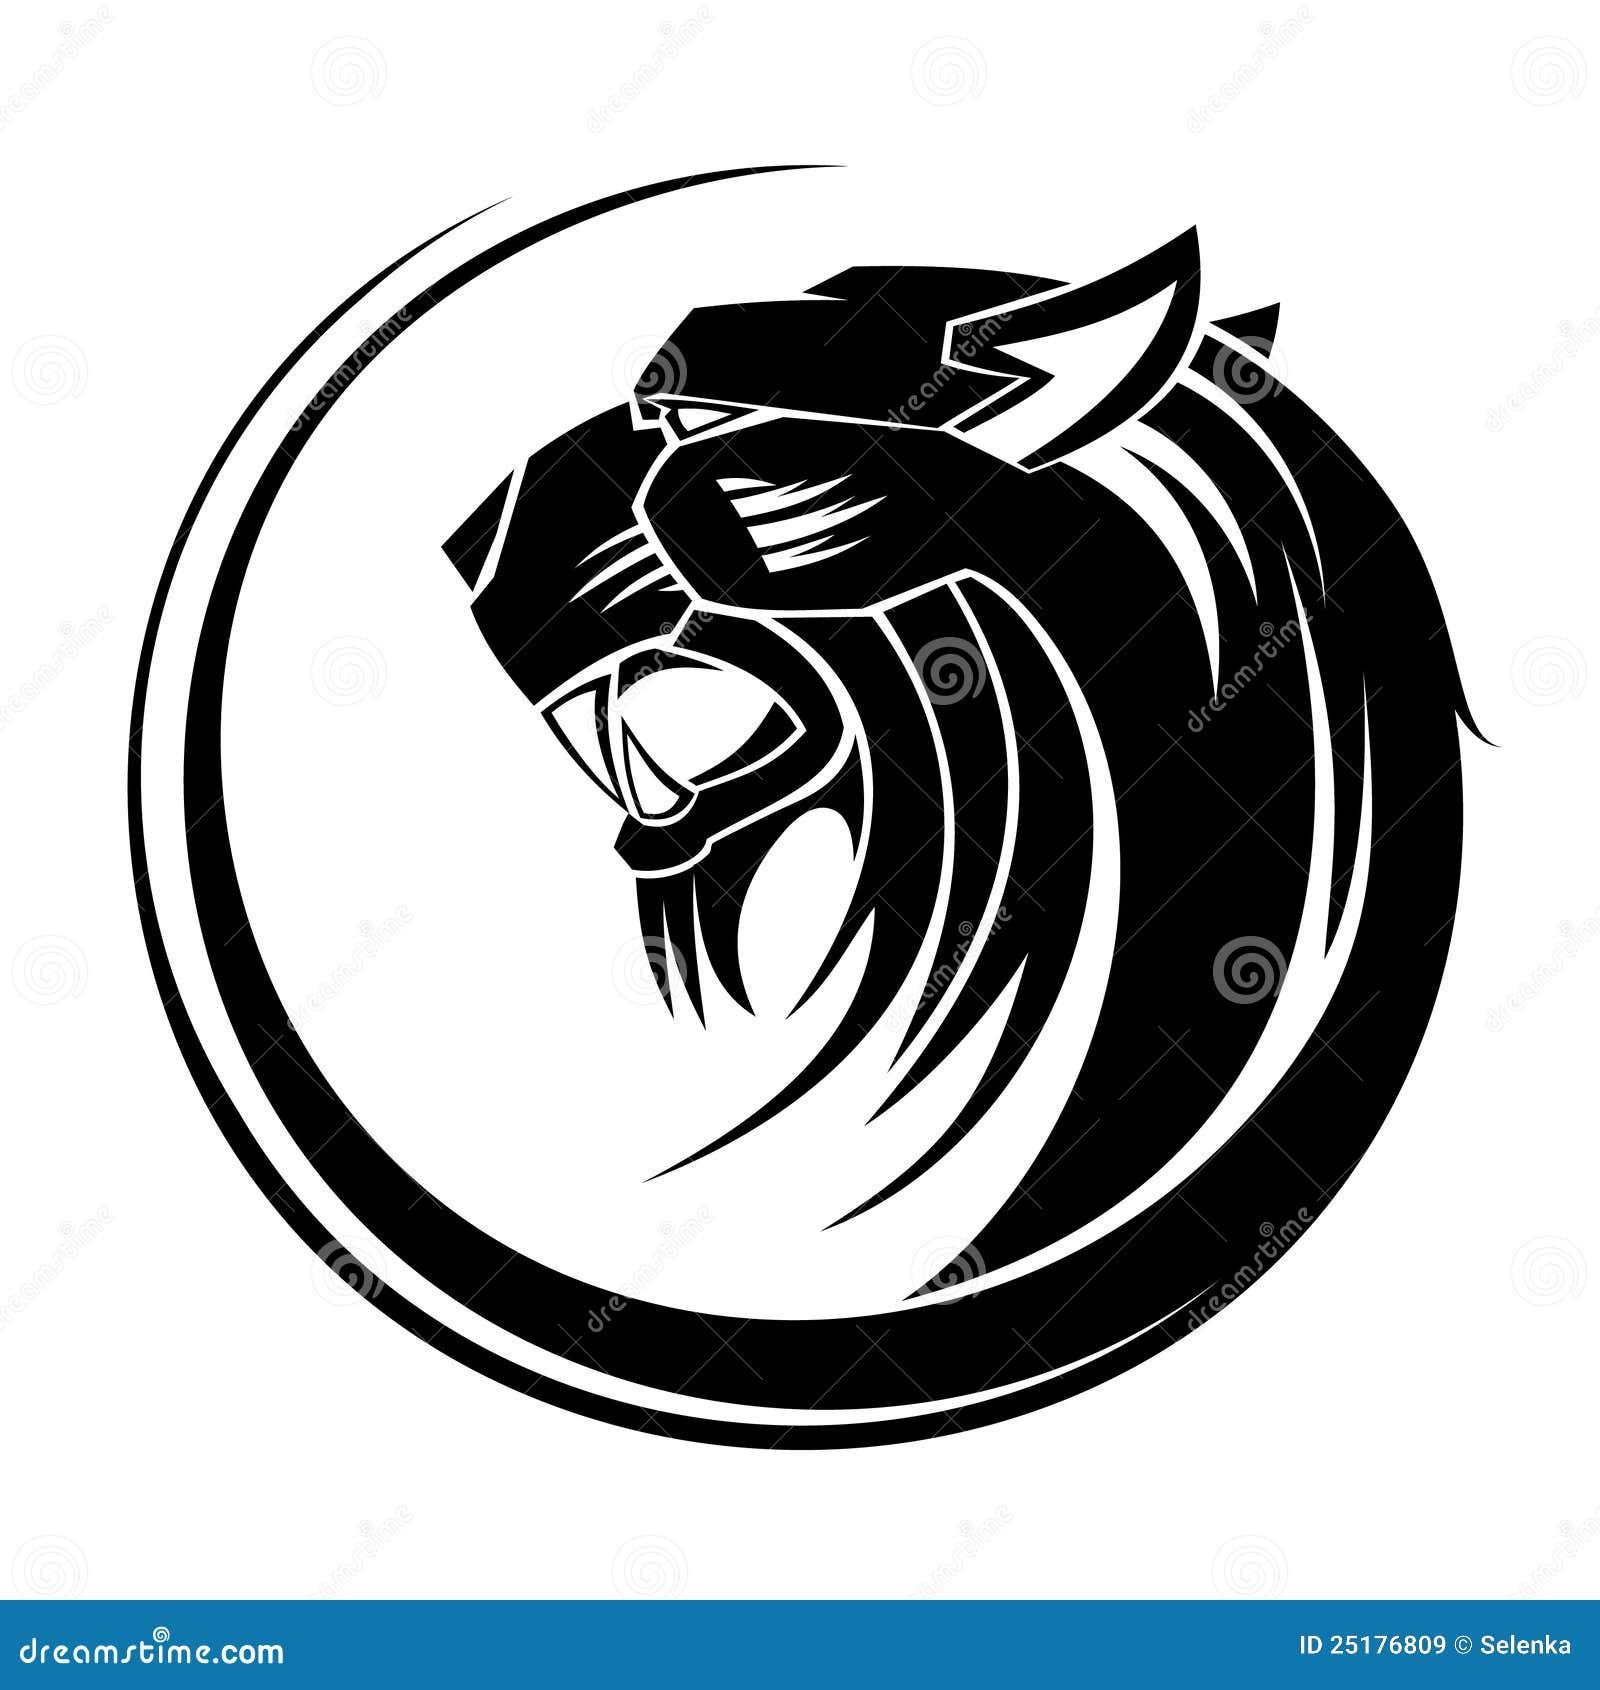 Lion Tribal Tattoo Art Stock Vector Illustration Of Artwork 25176809